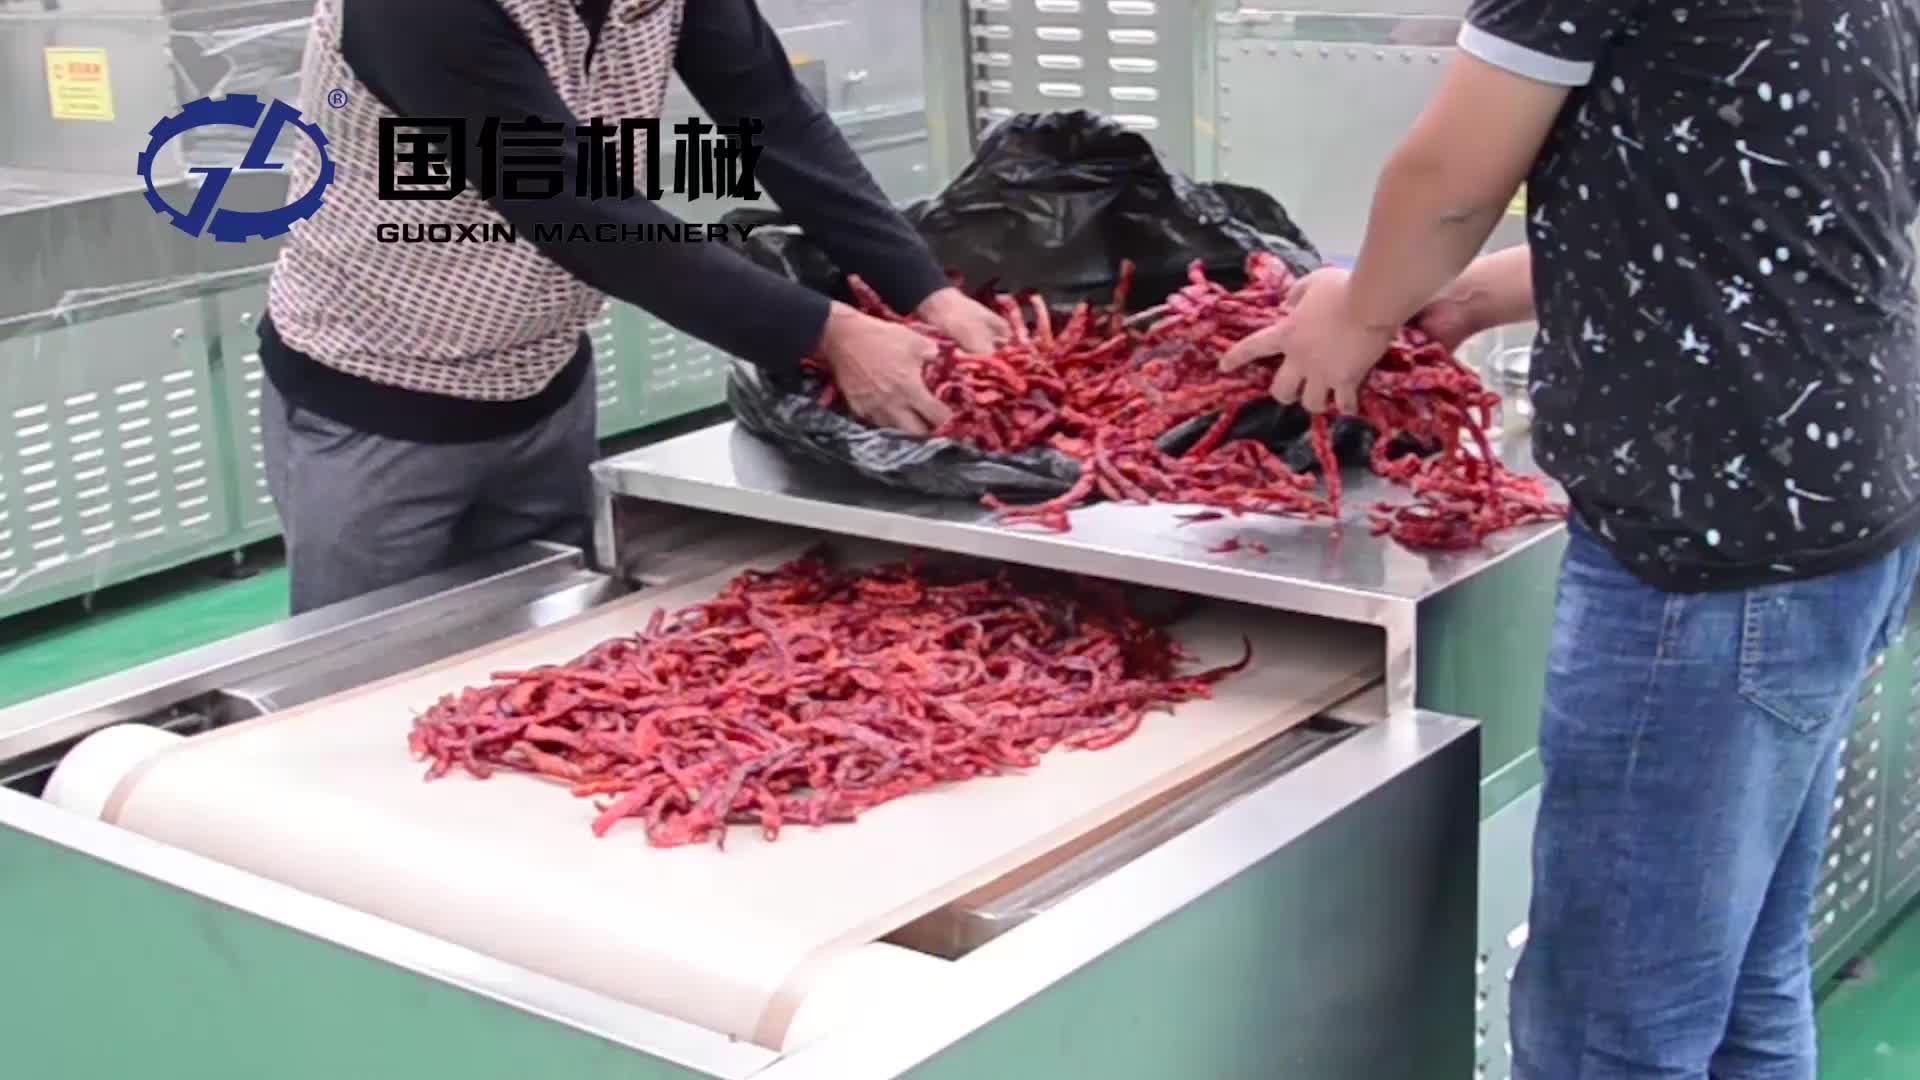 Endüstriyel konveyör bant tipi mikrodalga ot yaprak moringa yaprakları mantar gıda kurutma makinesi